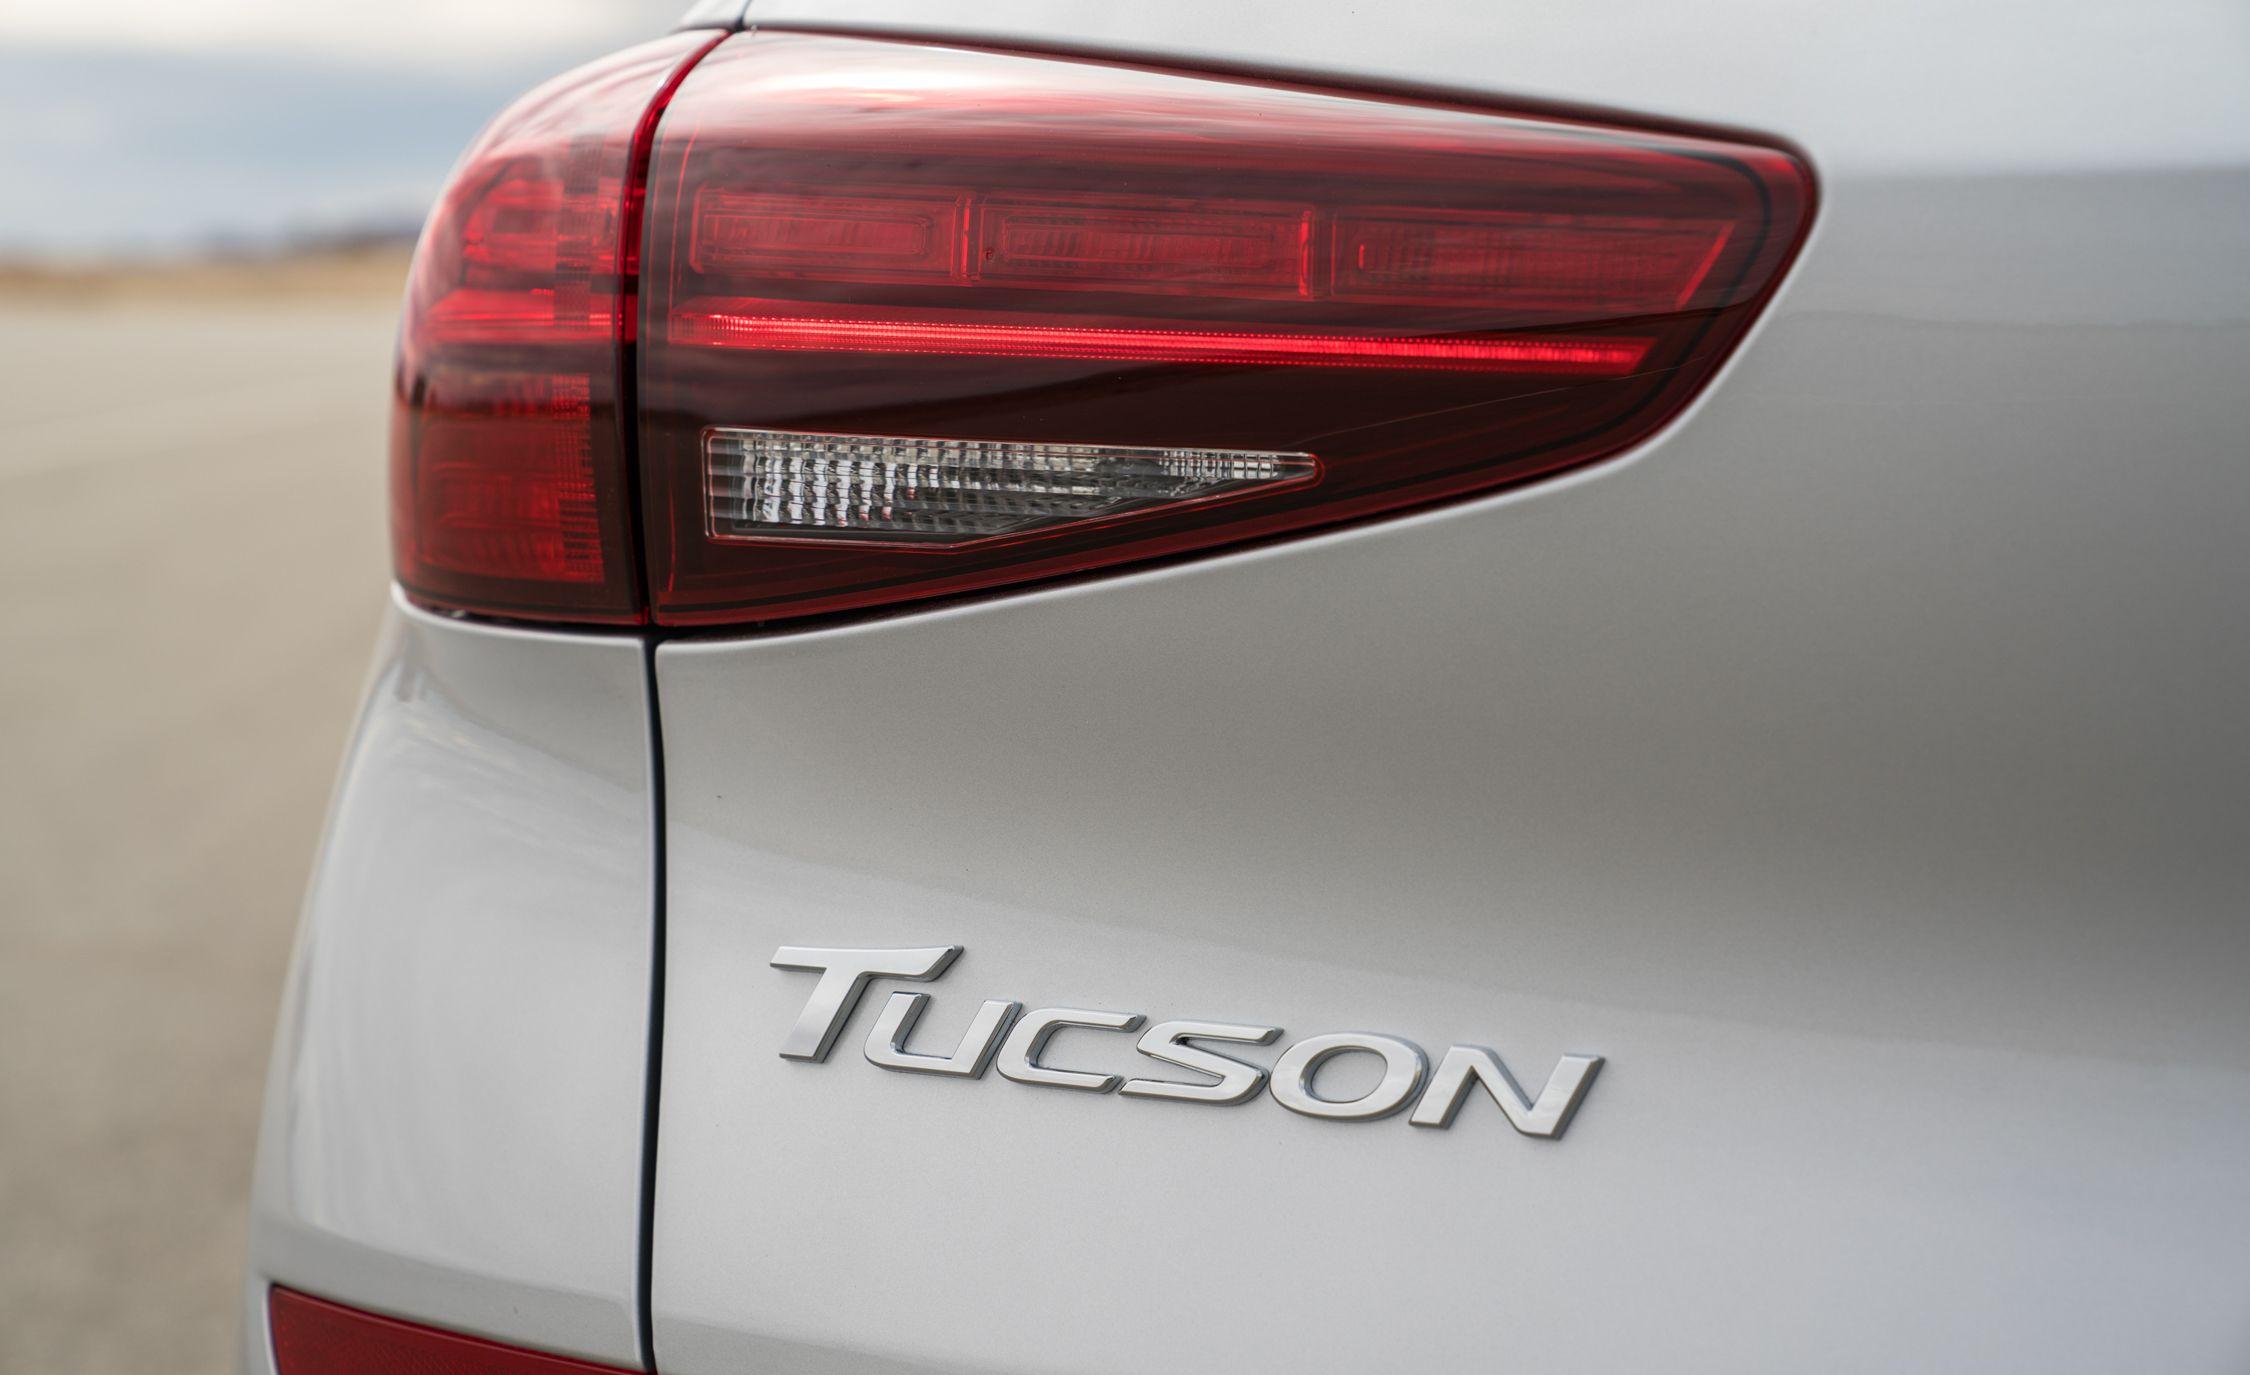 2019 Hyundai Tucson Reviews Hyundai Tucson Price Photos And